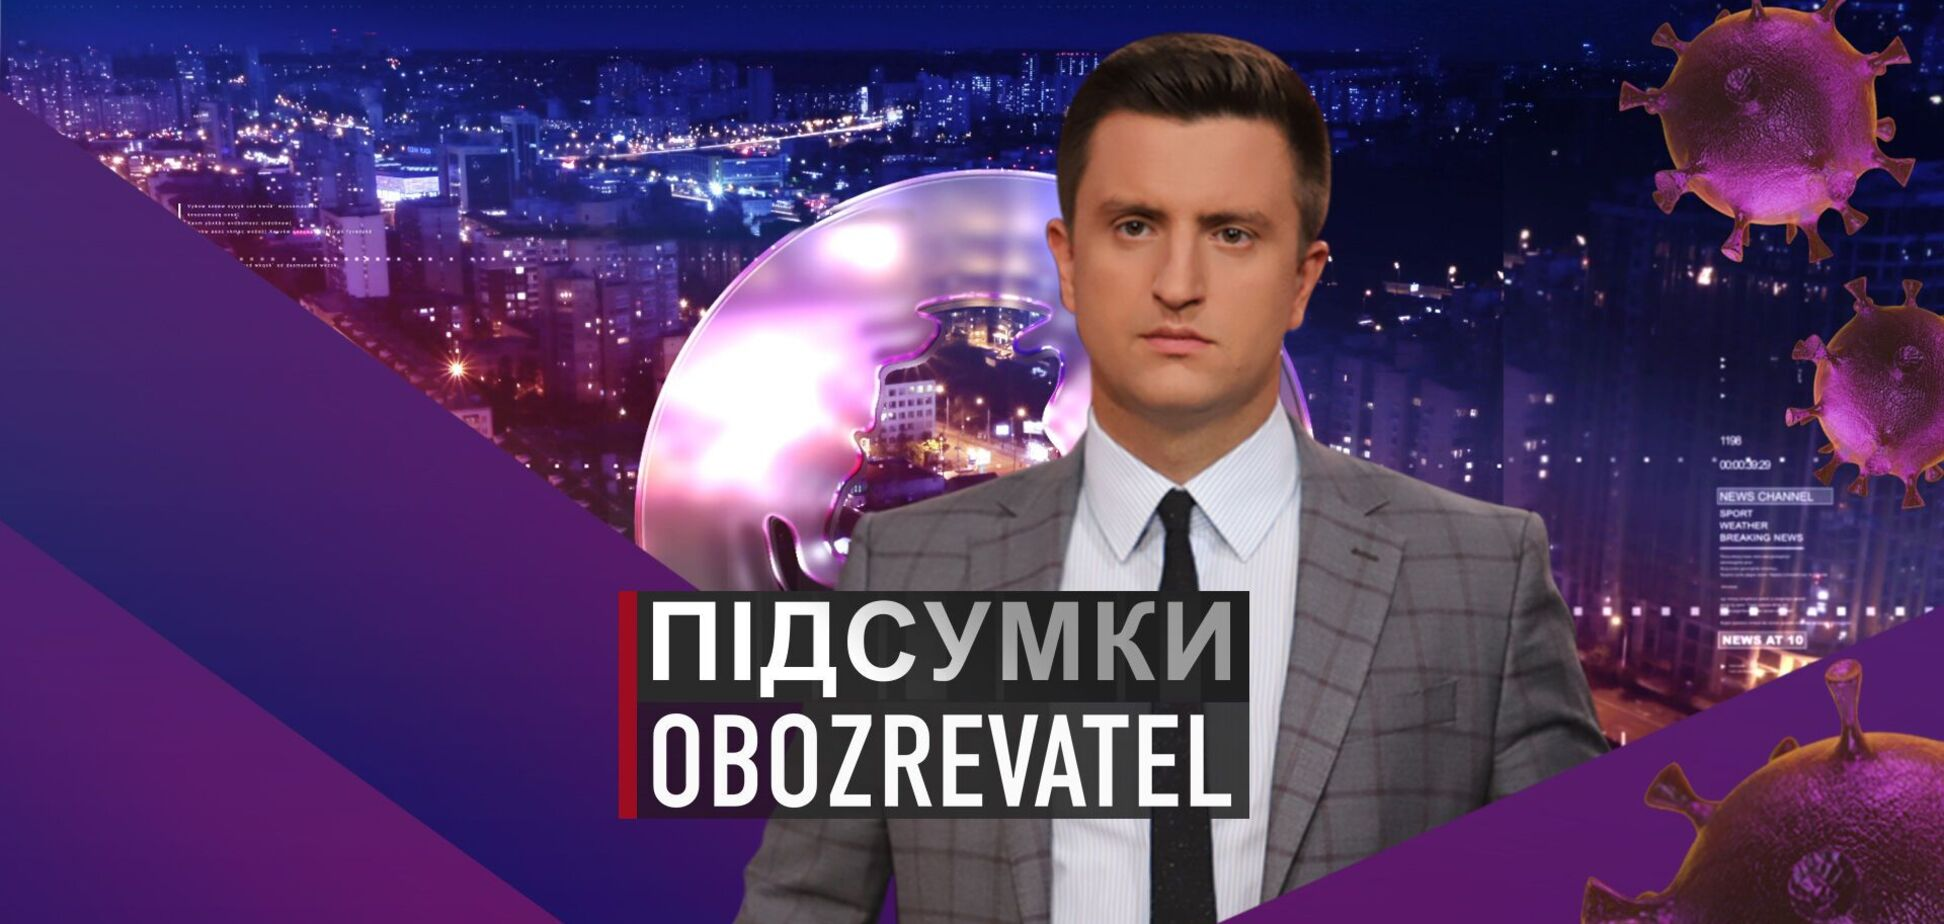 Підсумки с Вадимом Колодийчуком. Среда, 21 июля